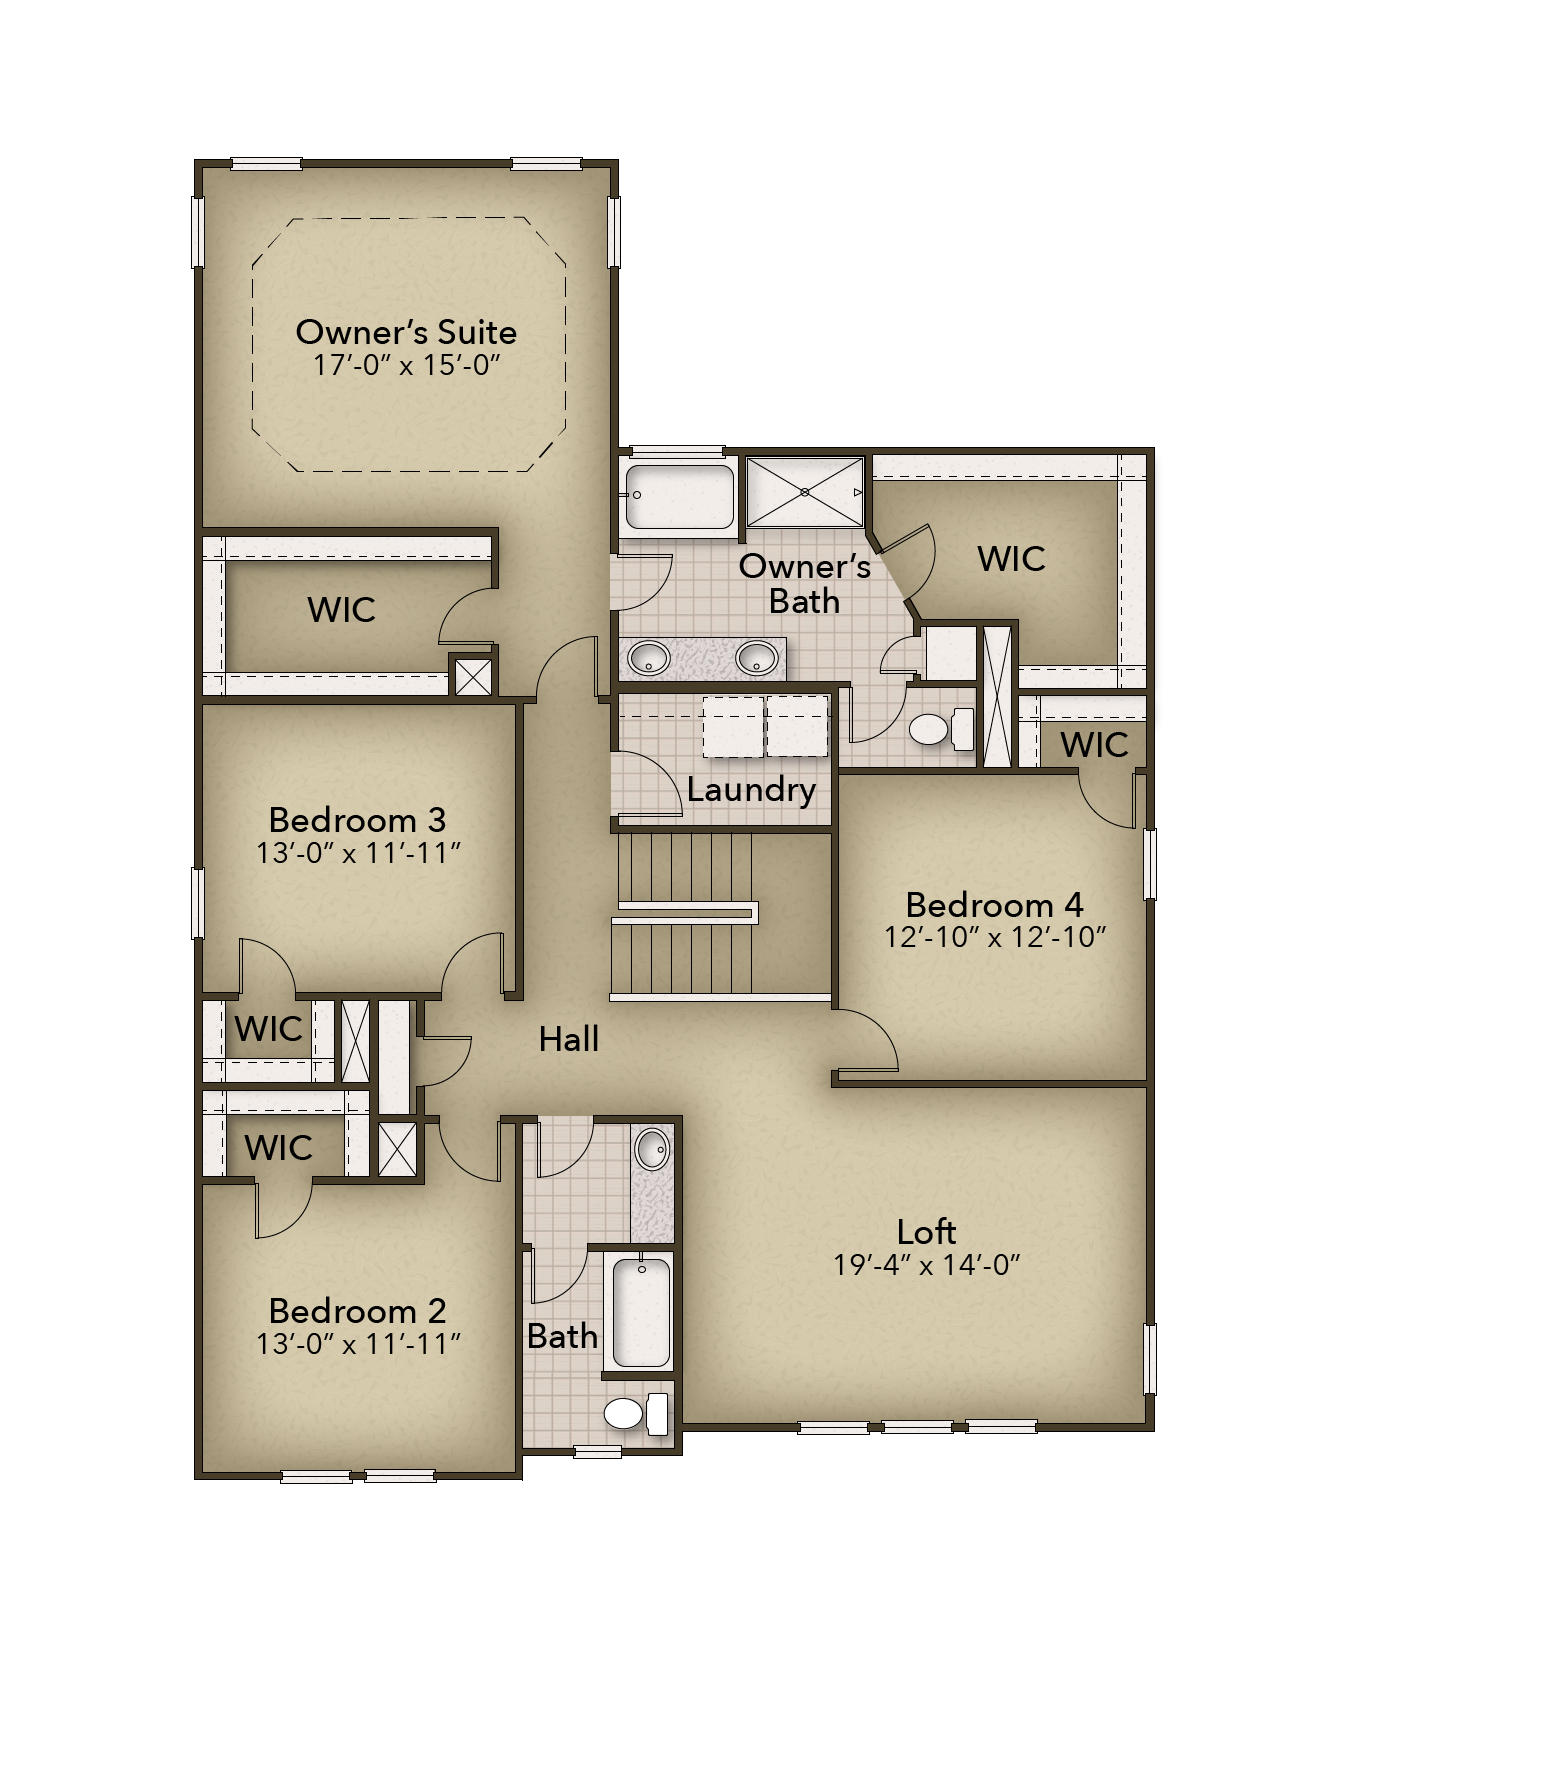 Chesapeake Homes -  The Mangrove Second Floor